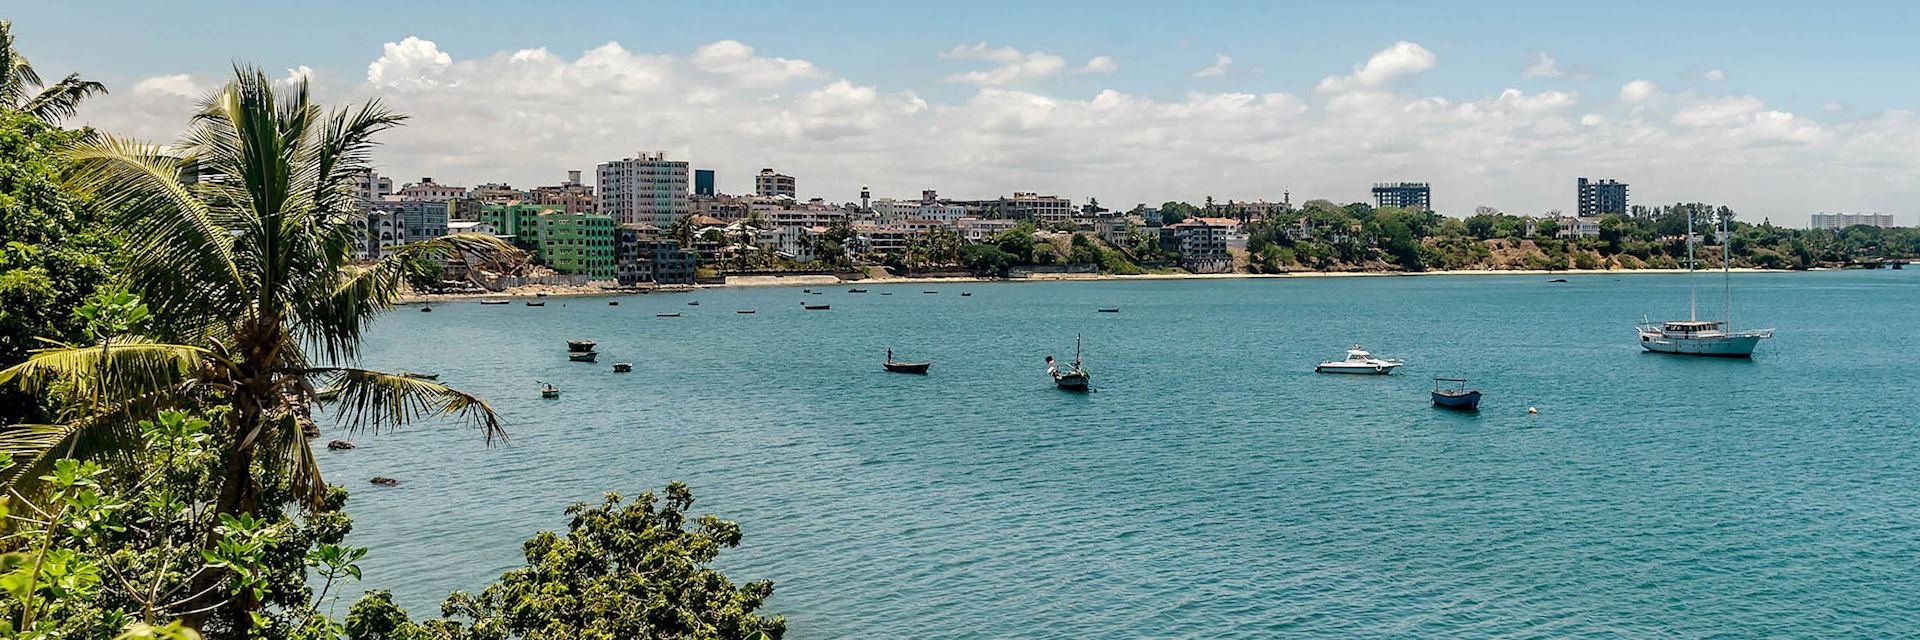 Mombasa waterfront, Kenya